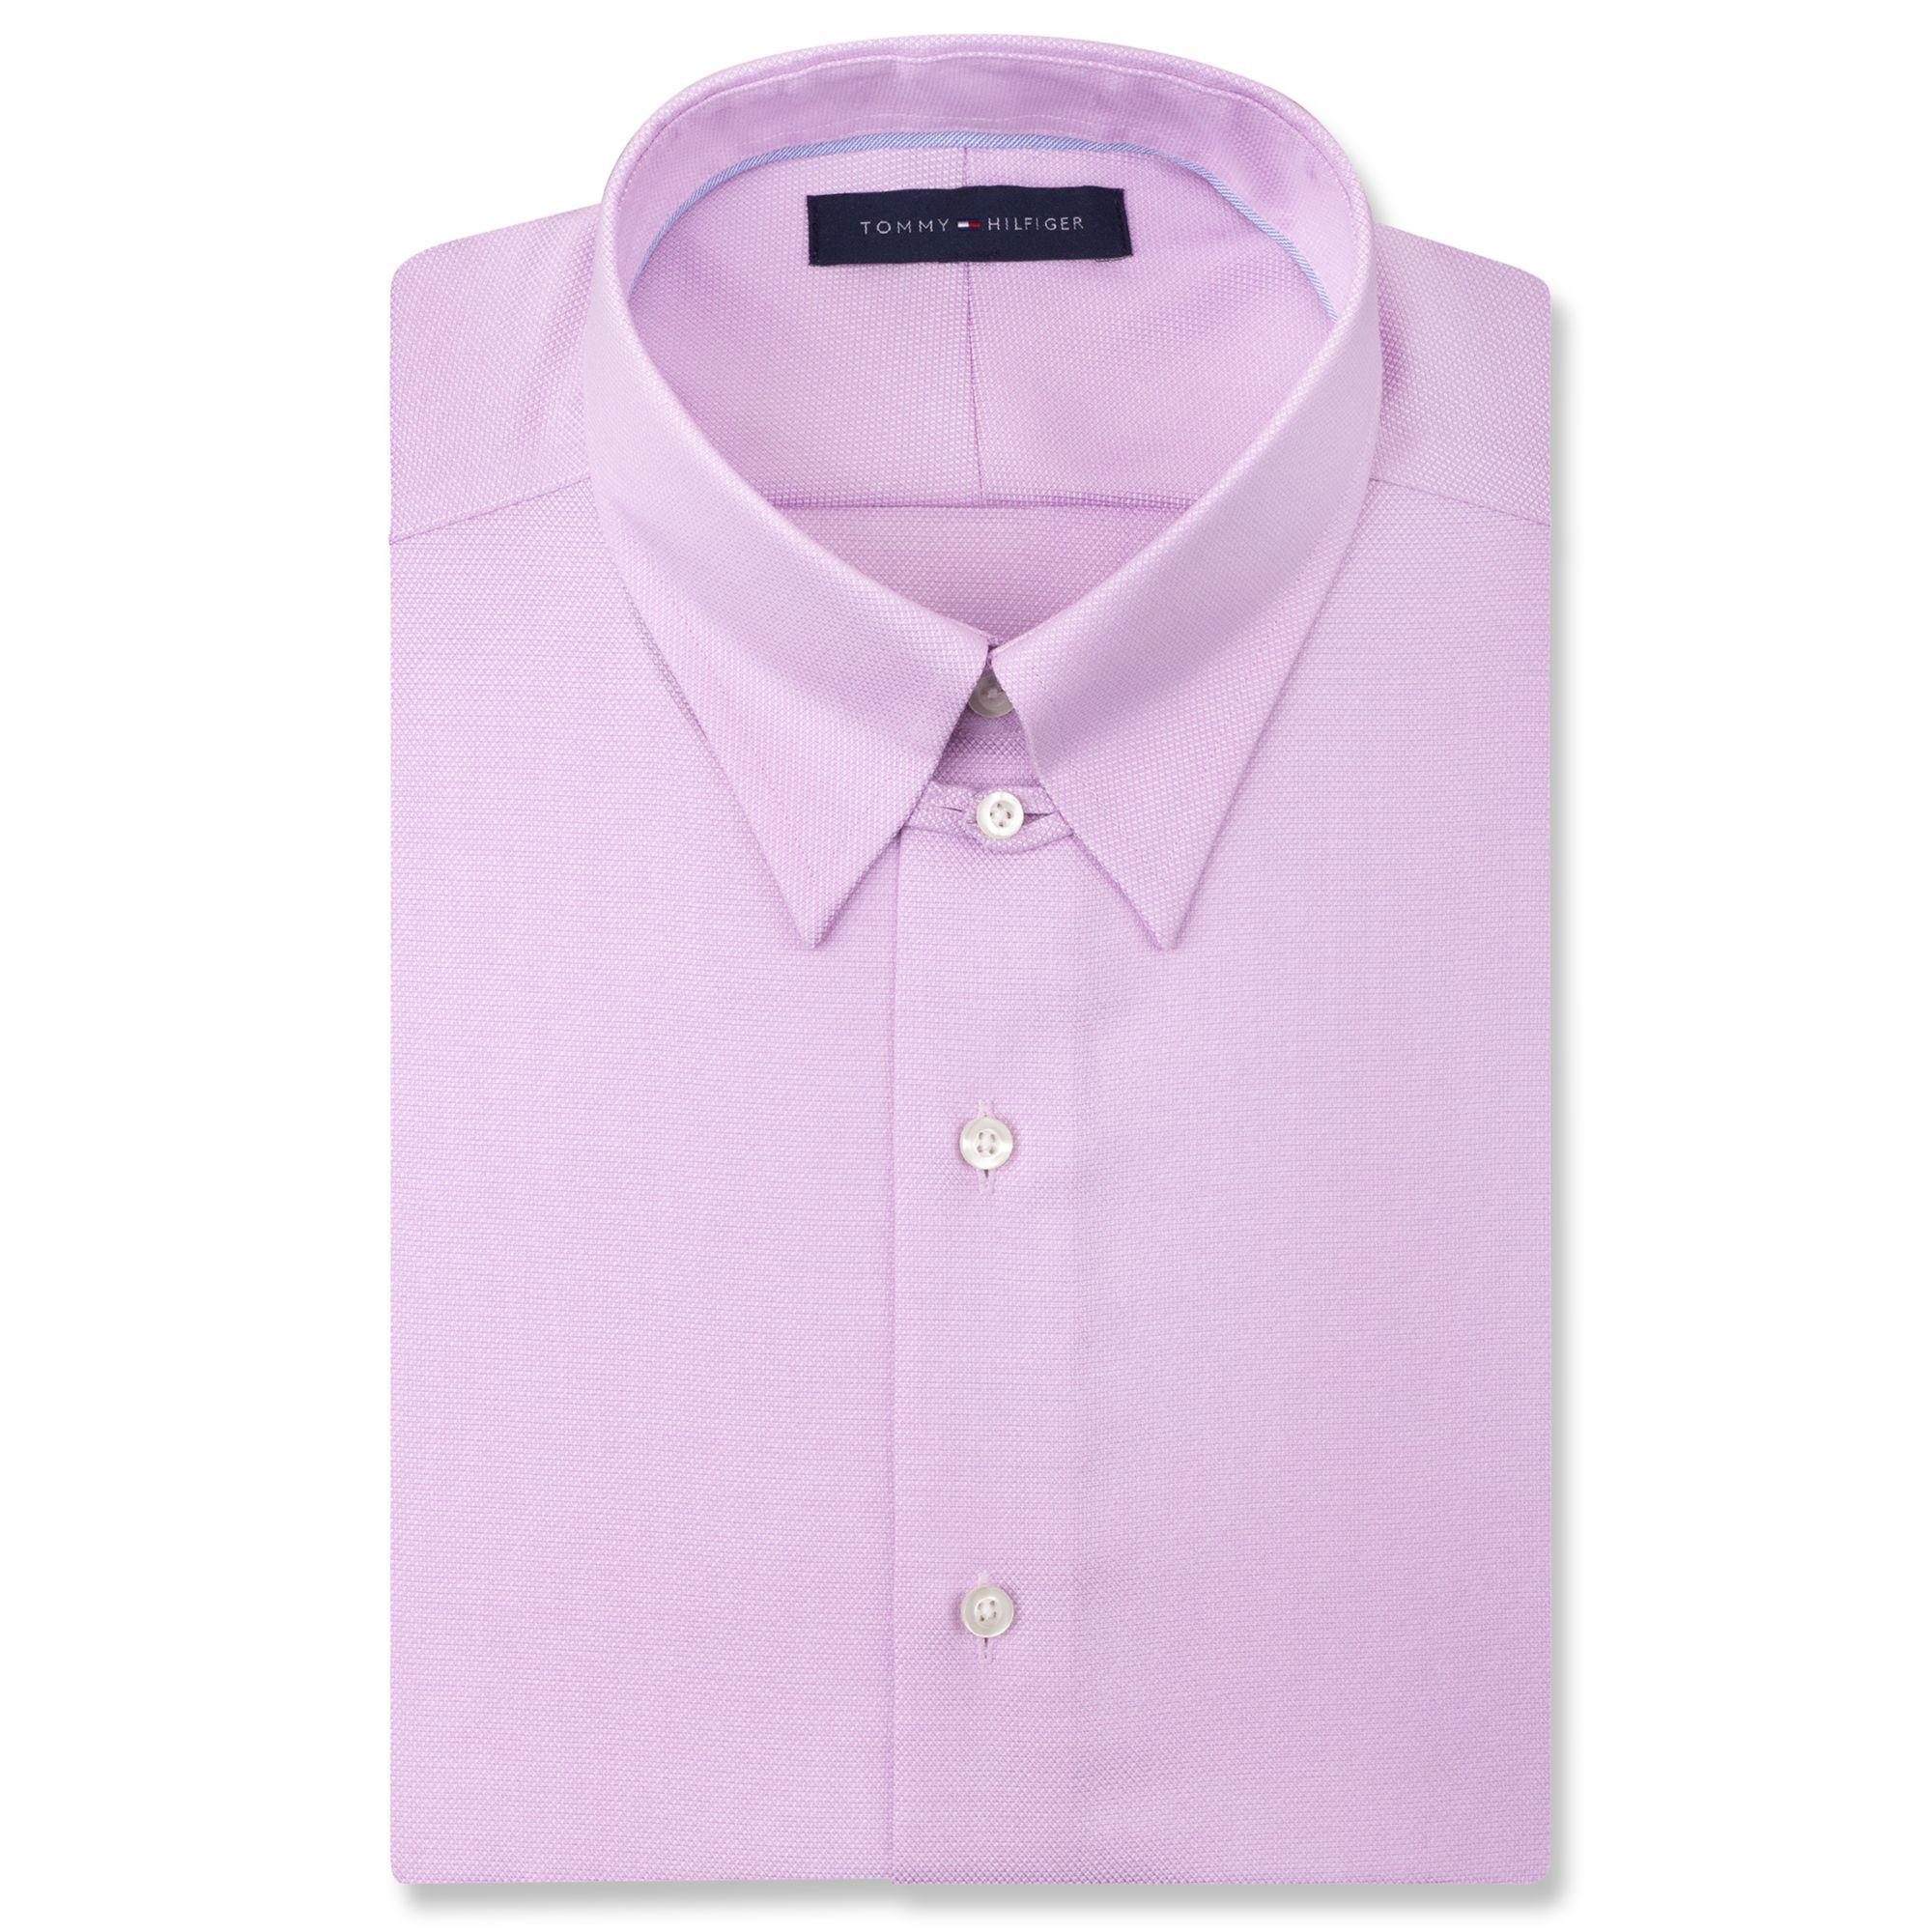 c0e00cf4 Tommy Hilfiger Noiron Gatsby Lavender Solid Tab Collar Dress Shirt ...